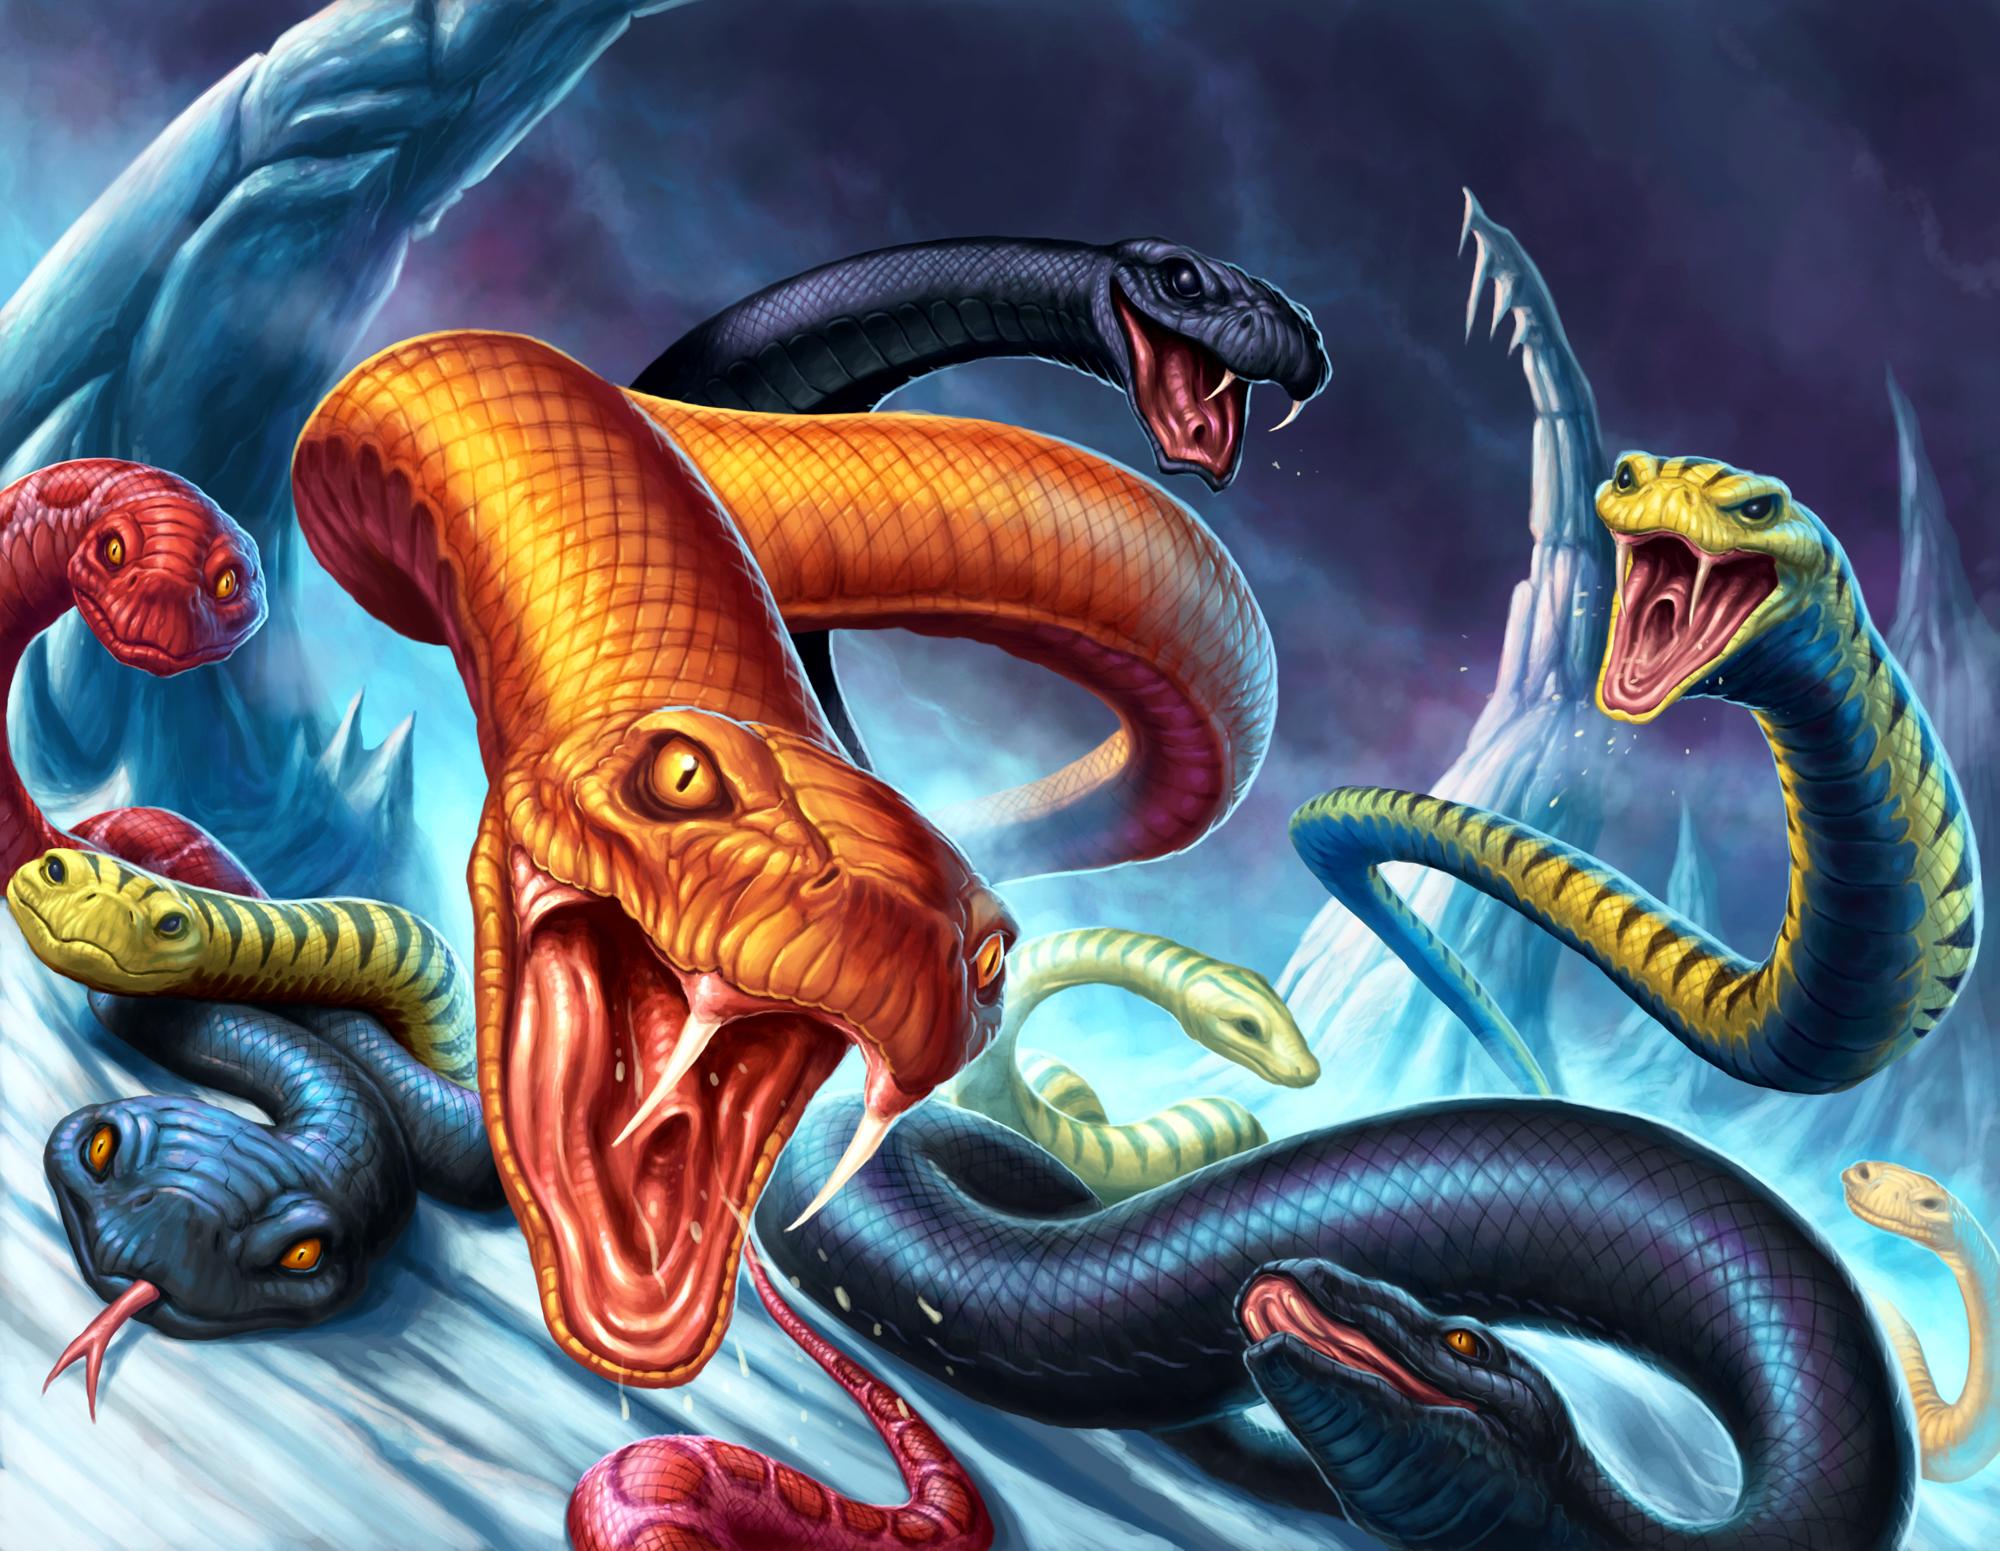 Serpent's Nest by DaveAllsop